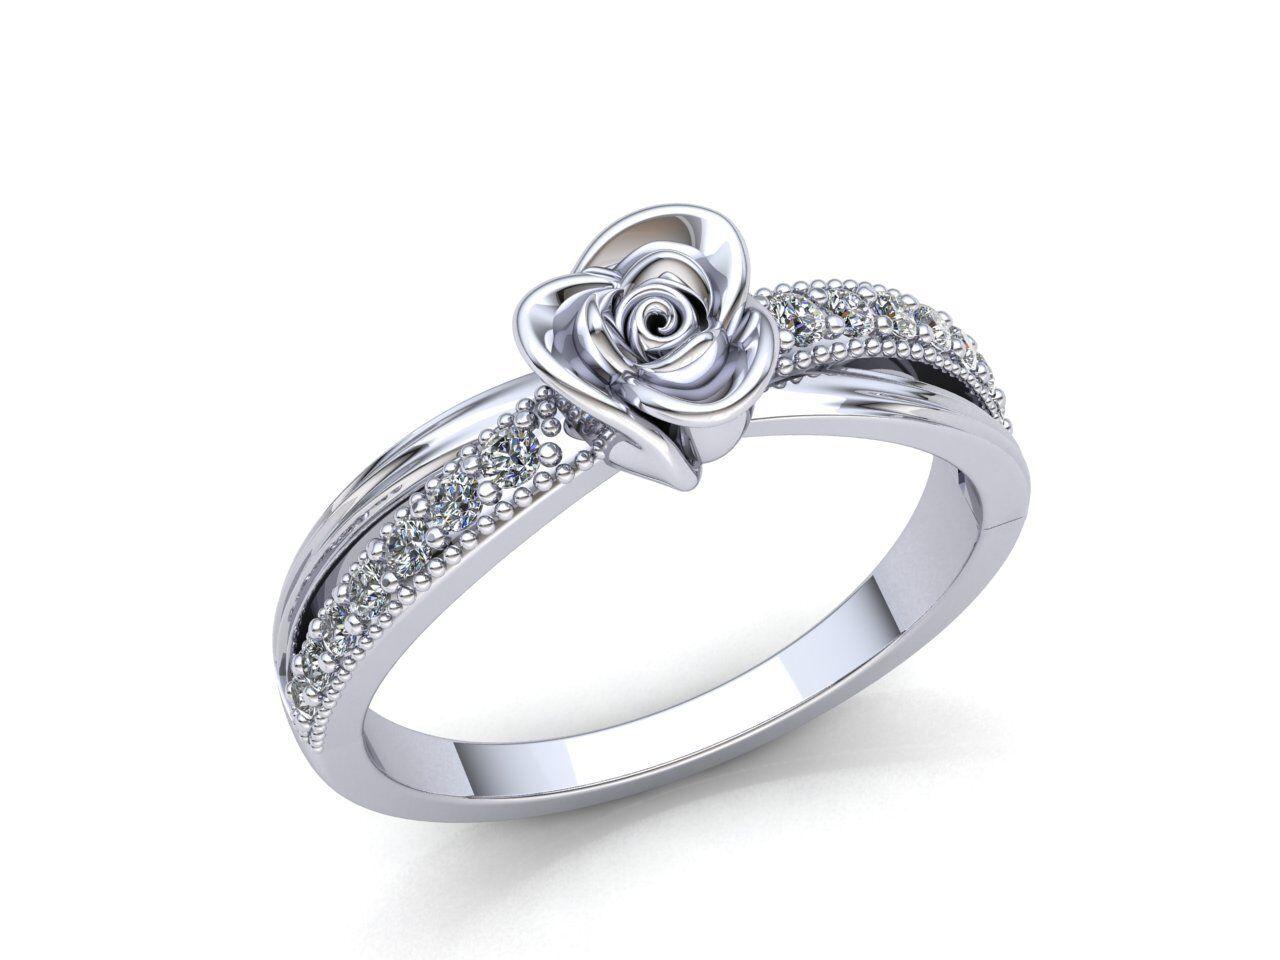 0.5carat Round Cut Diamond Ladies Milgrain Flower Fancy Engagement Ring 18K gold